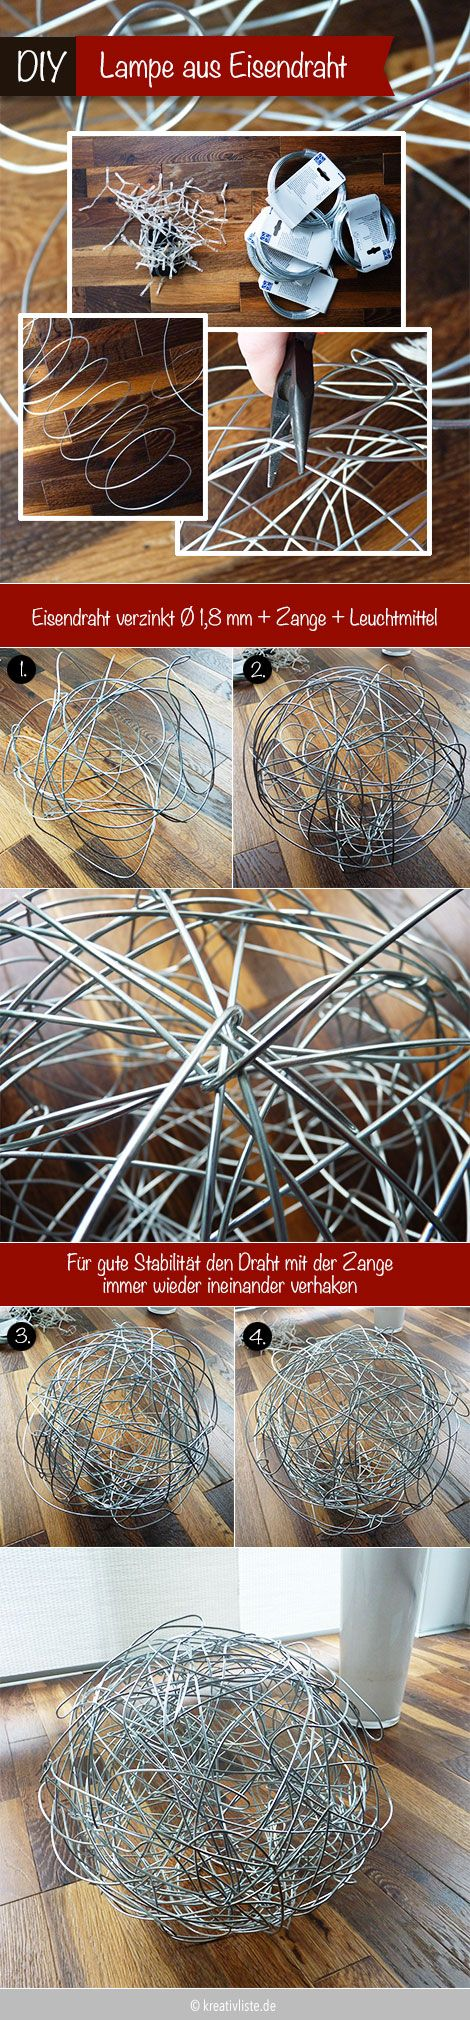 #Lampe selber machen #DIY Drahtleuchte #lamp - Anleitung auf www.kreativliste.de